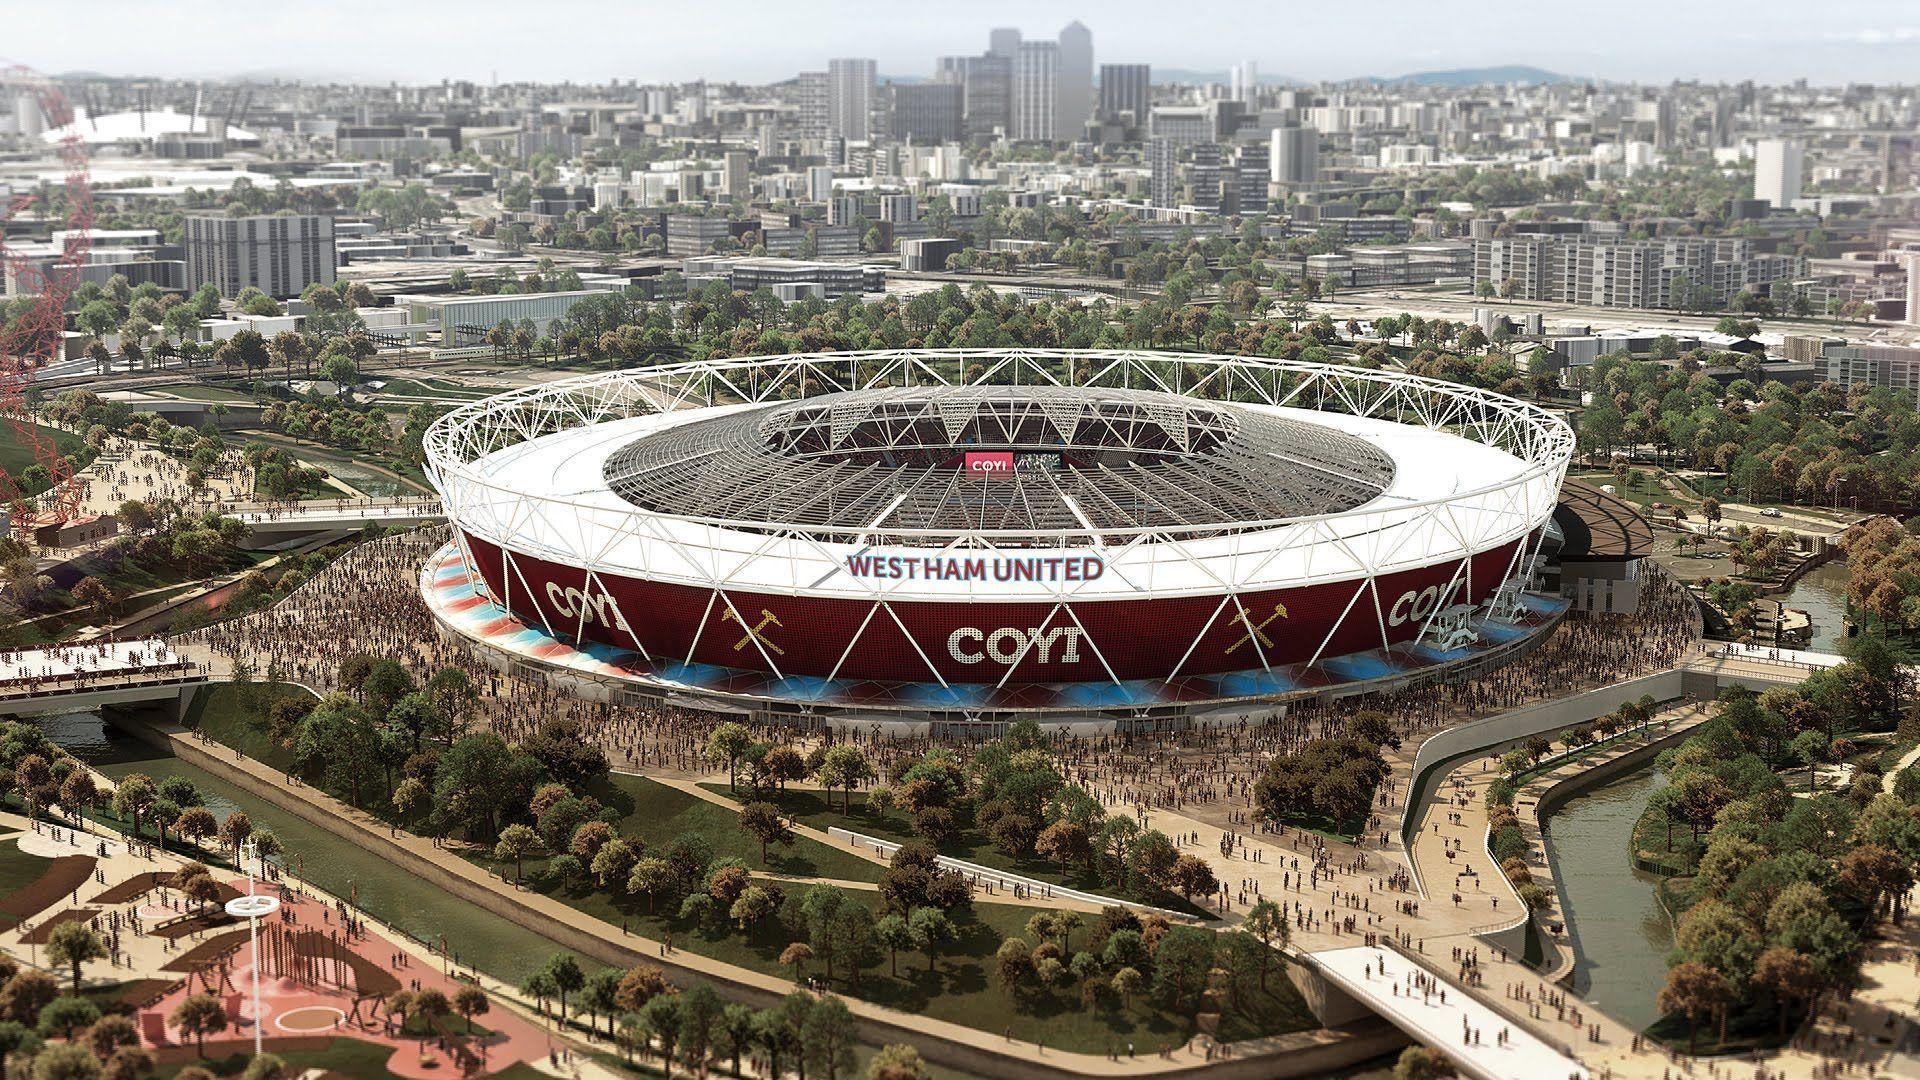 West Ham United Stadion